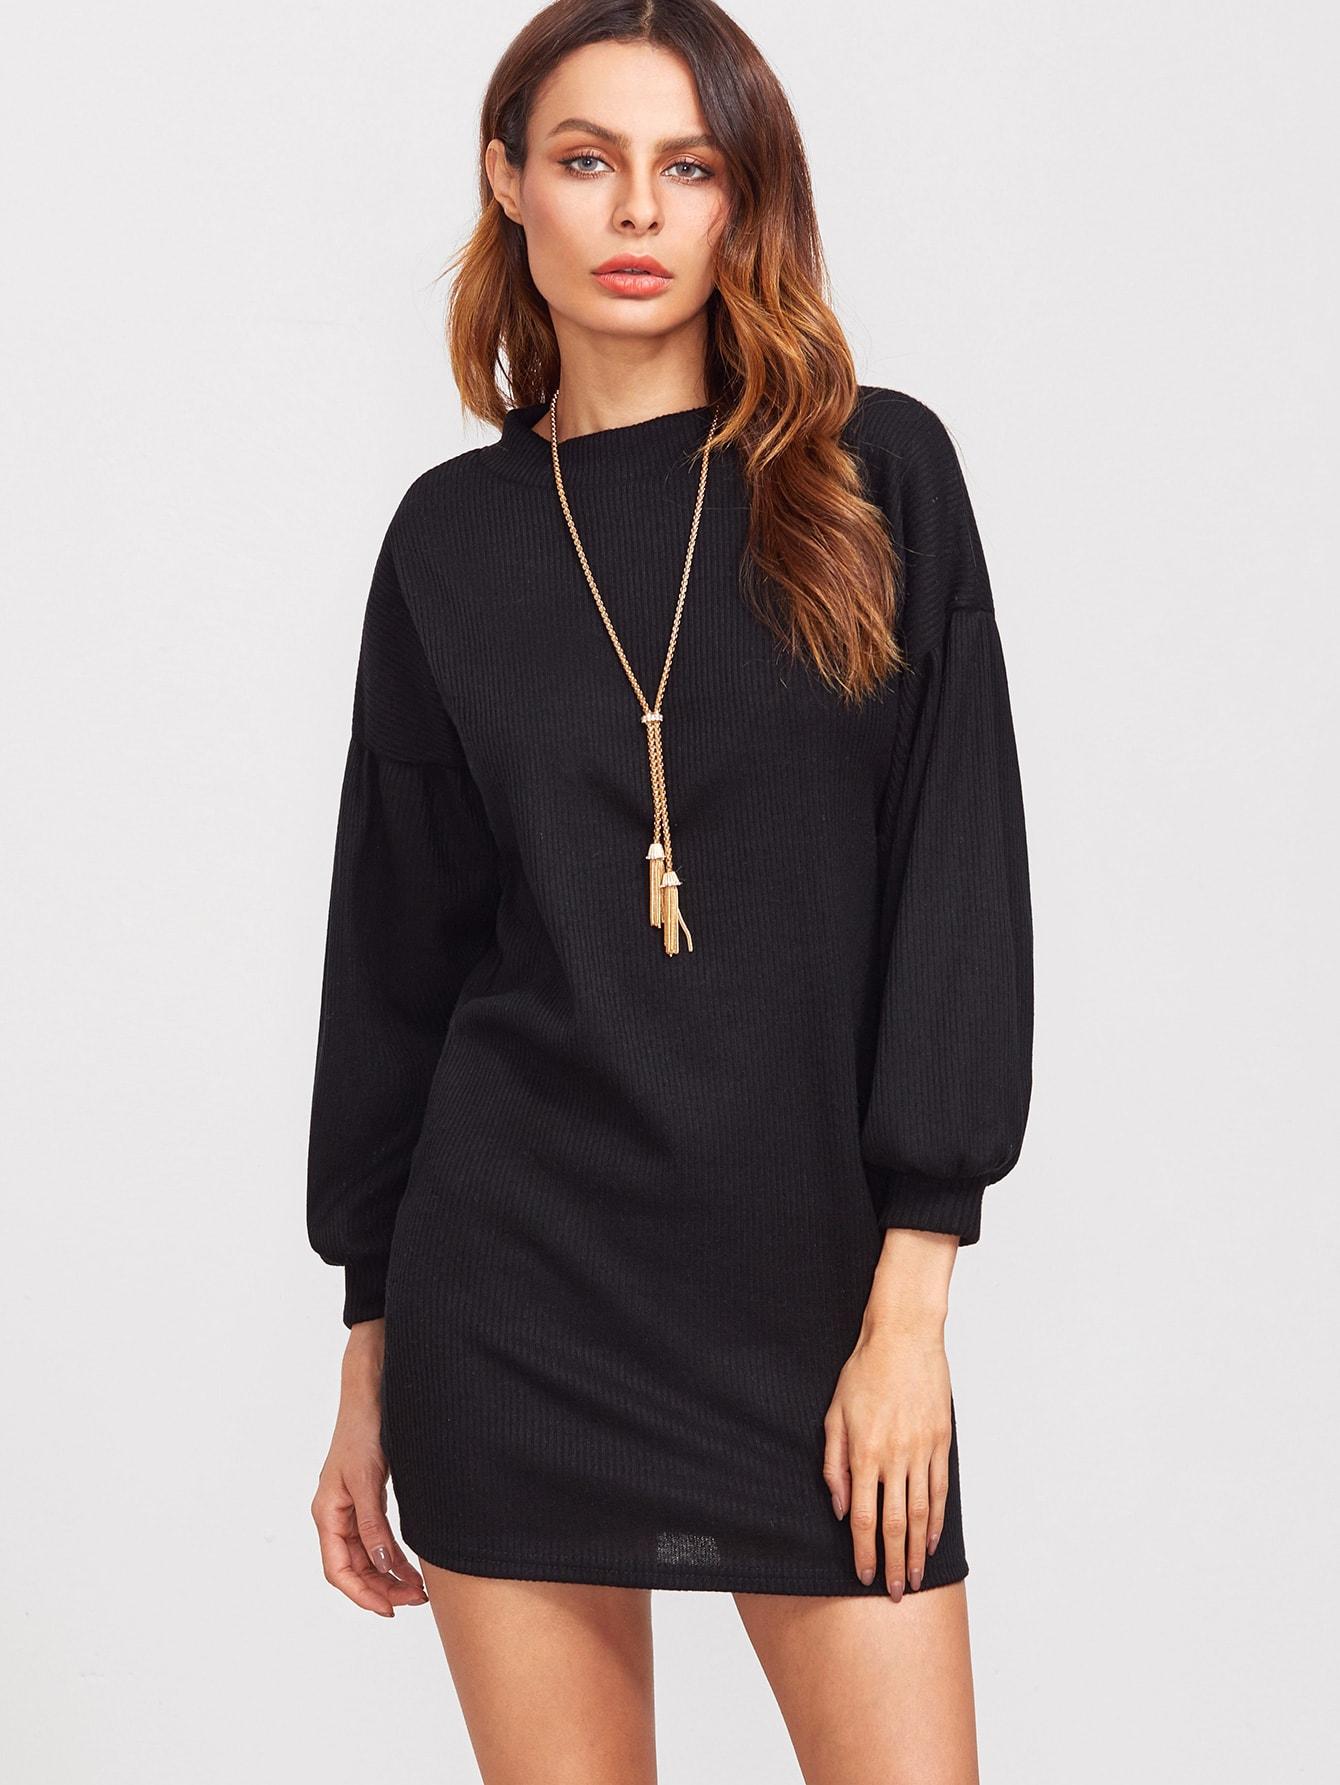 Black Dropped Shoulder Seam Lantern Sleeve Sweater Dress